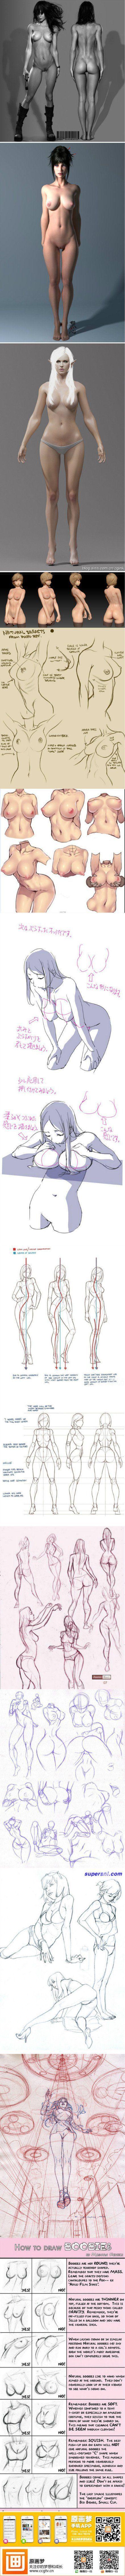 How to Draw the Female Face | Body anatomy. How to draw female body ...